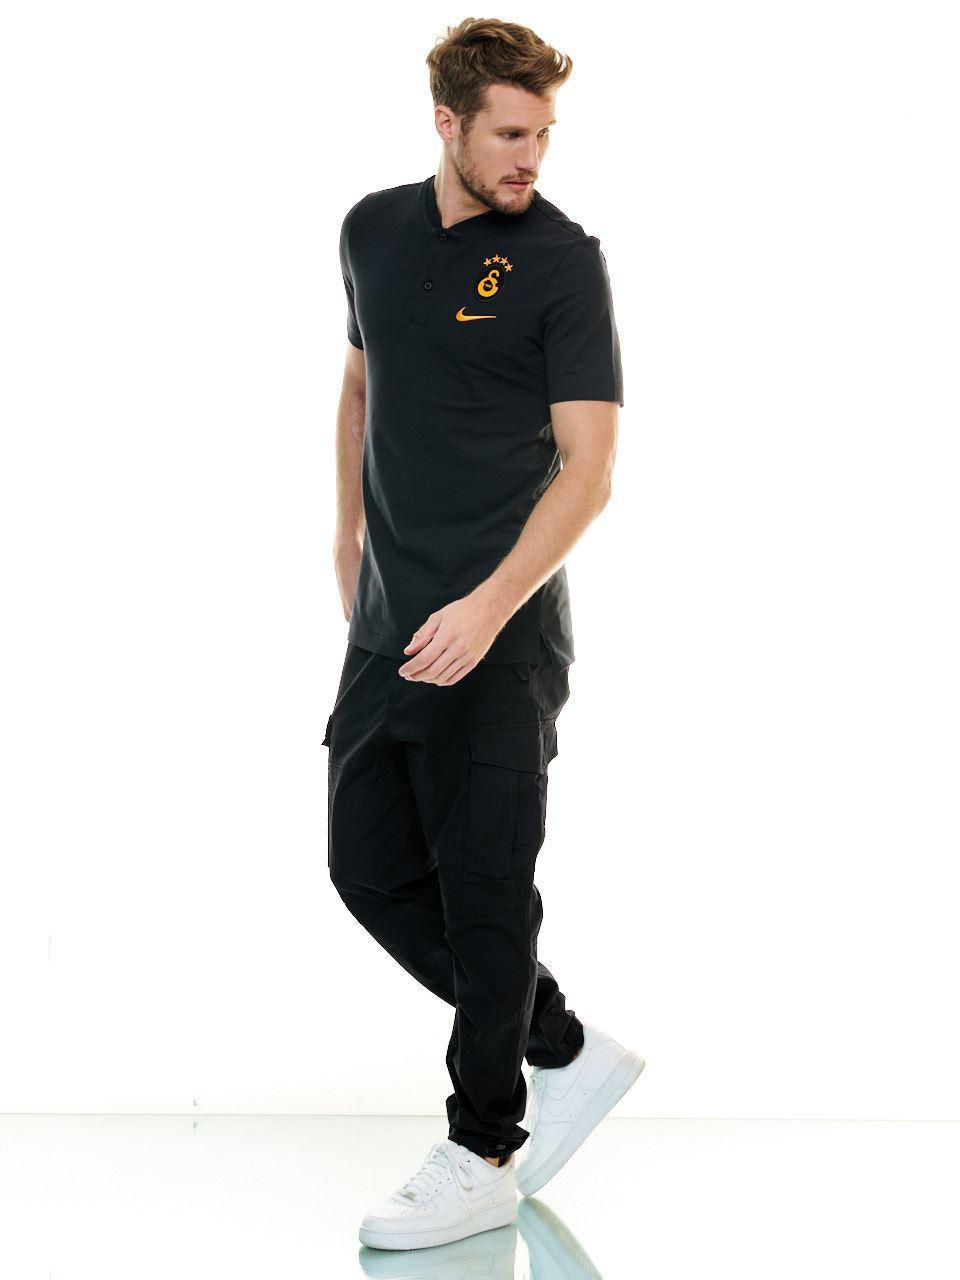 Nike Galatasaray Polo T-shirt Ck9306-010